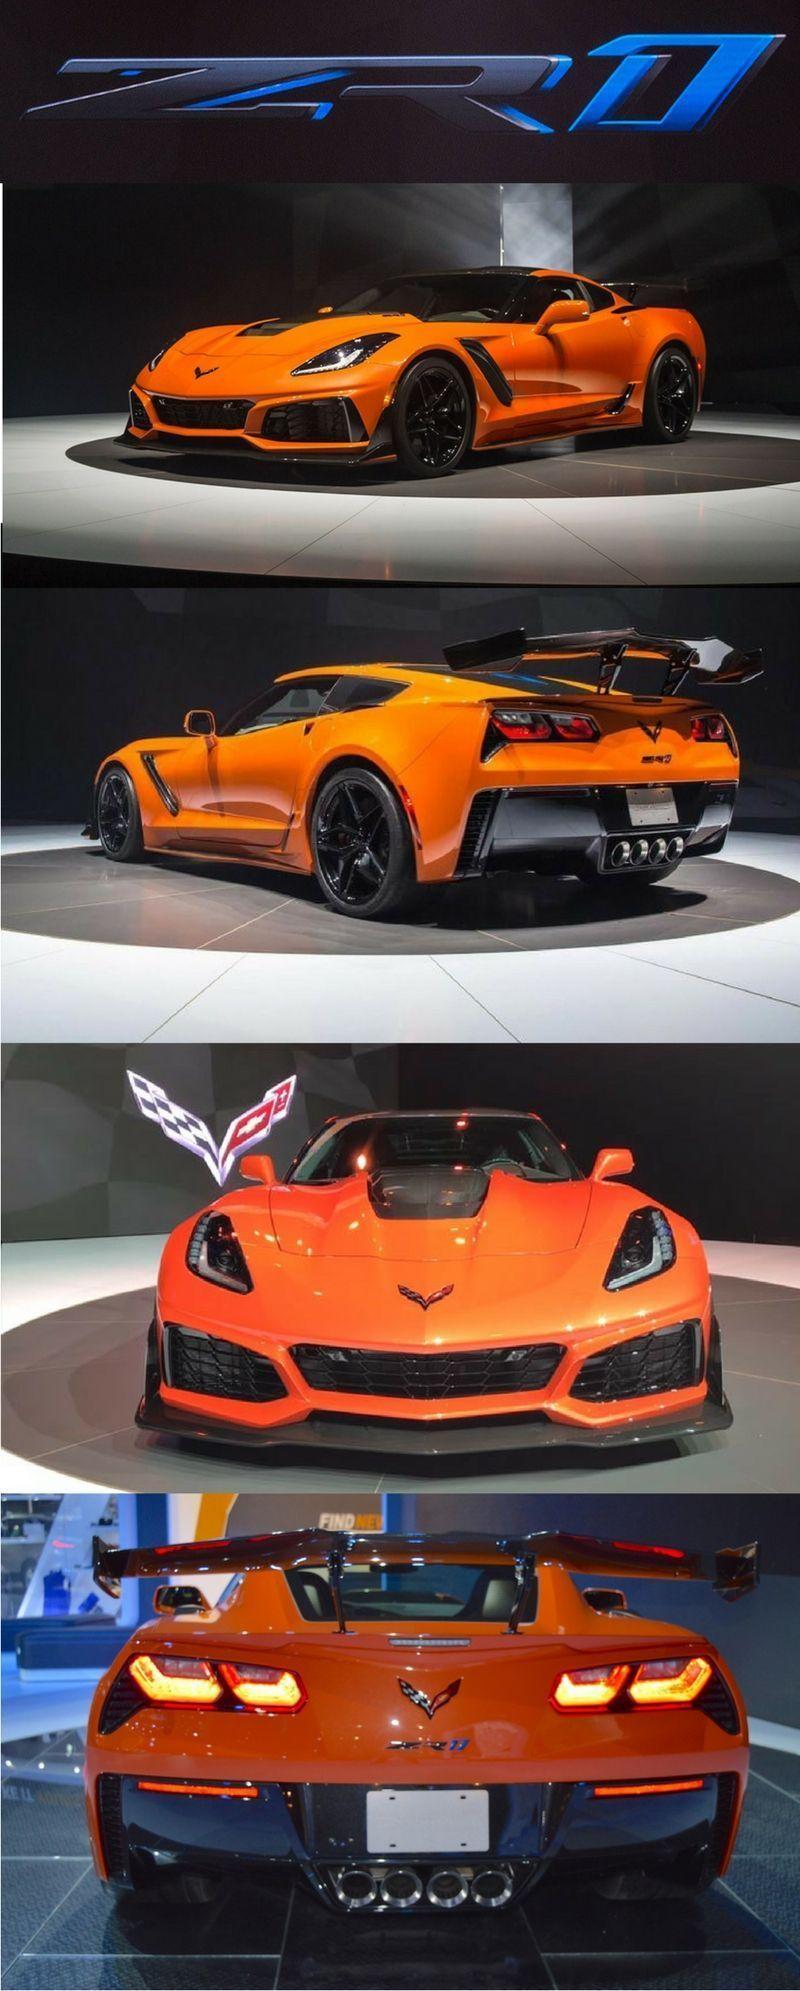 2019 Chevrolet Corvette Zr1 With 766 Horsepower Is Fastest Ever